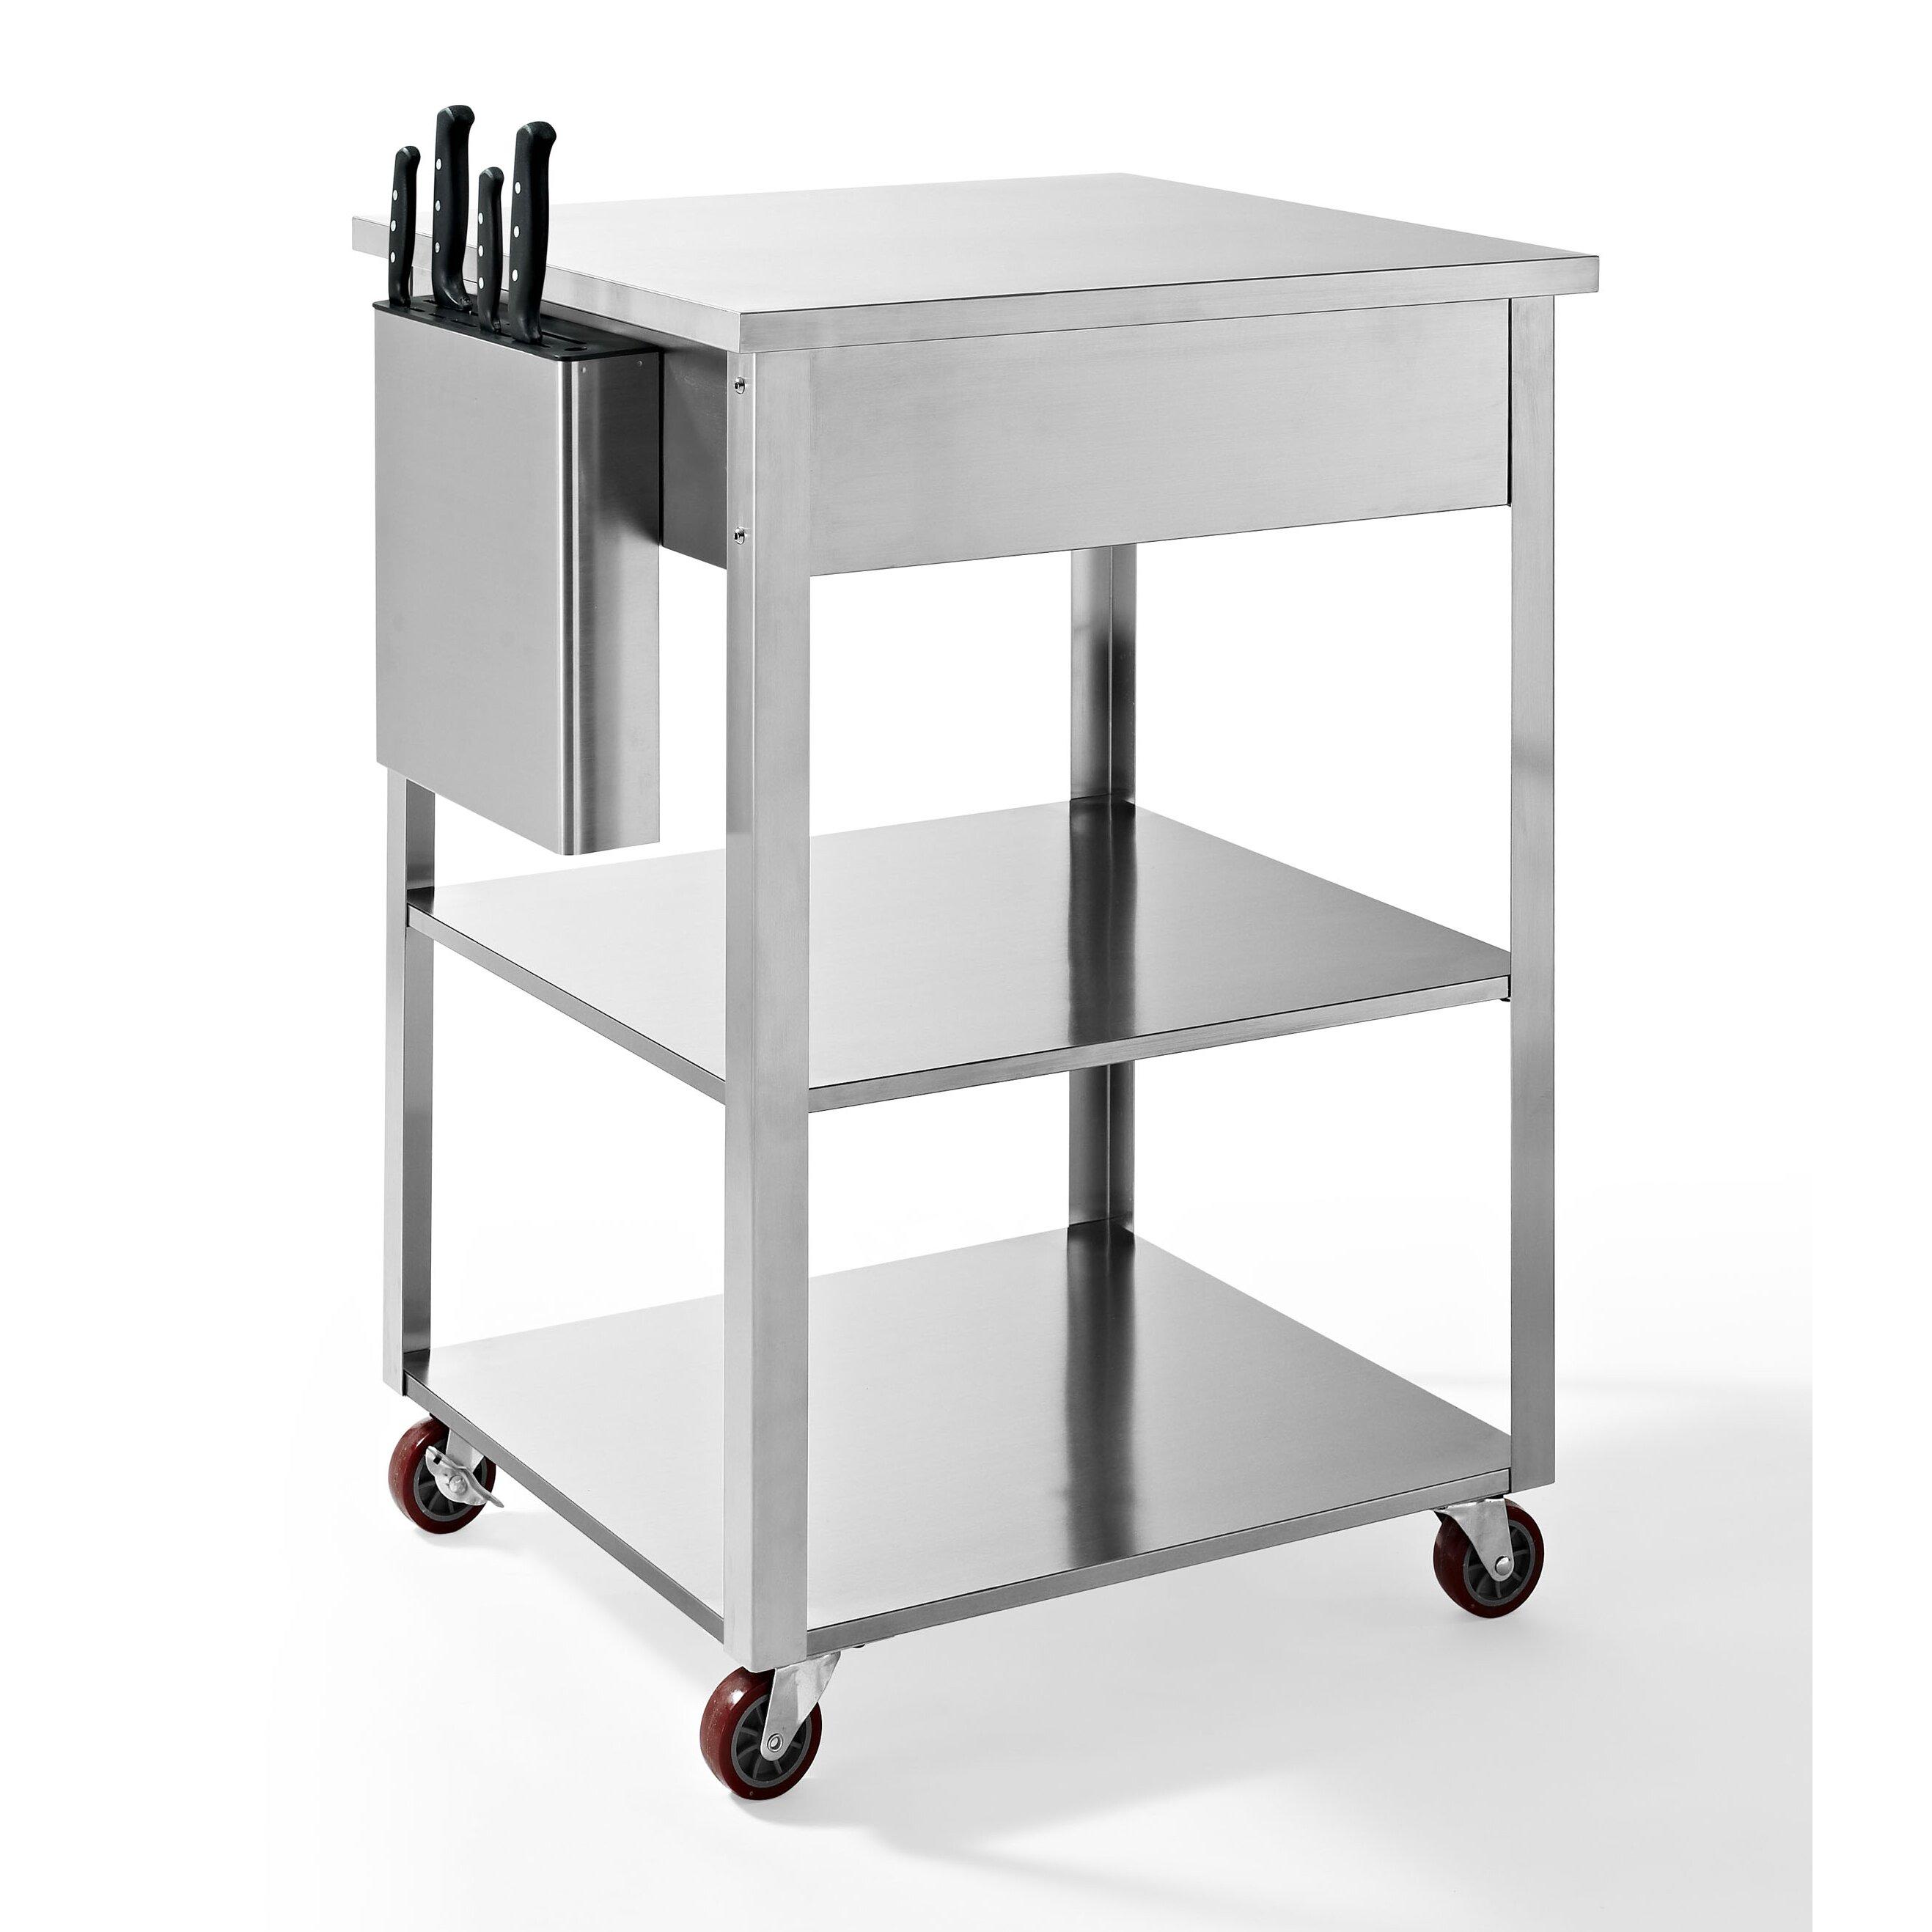 Serving Carts Kitchen Islands